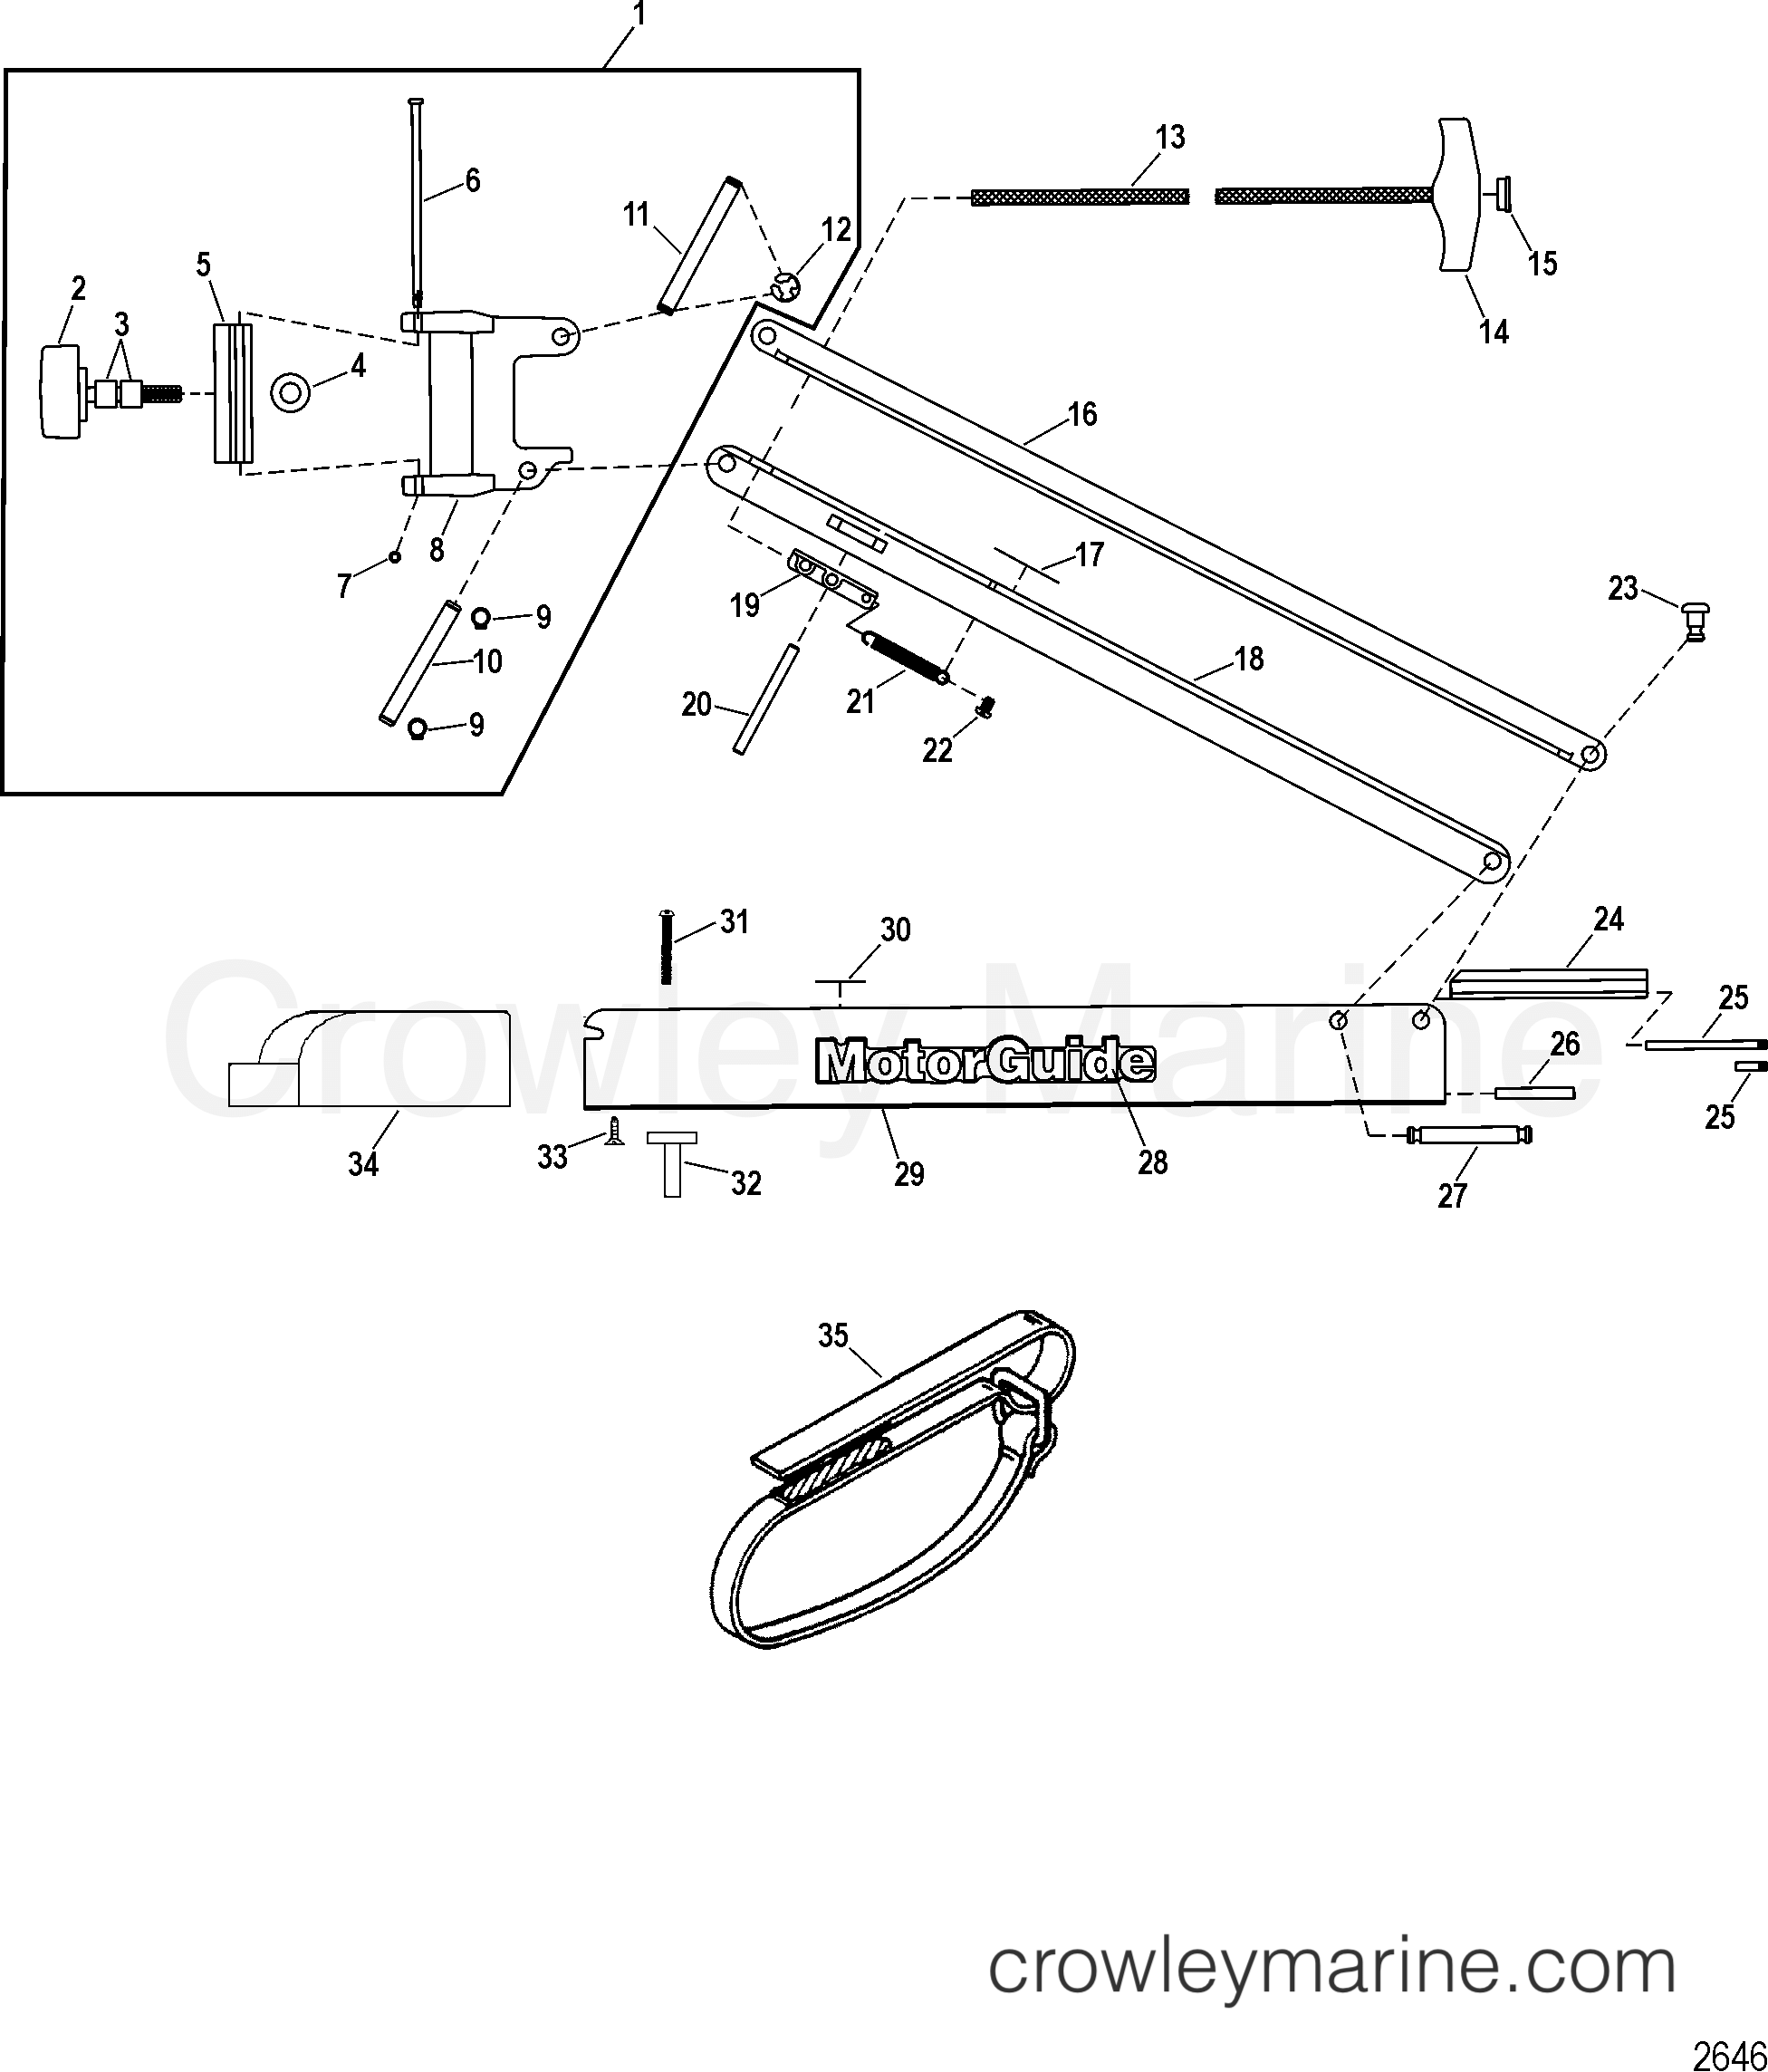 2005 MotorGuide 12V [MOTORGUIDE] - 921310040 07 BOW (BLACK)(42.00 INCH) (MST90742A) section